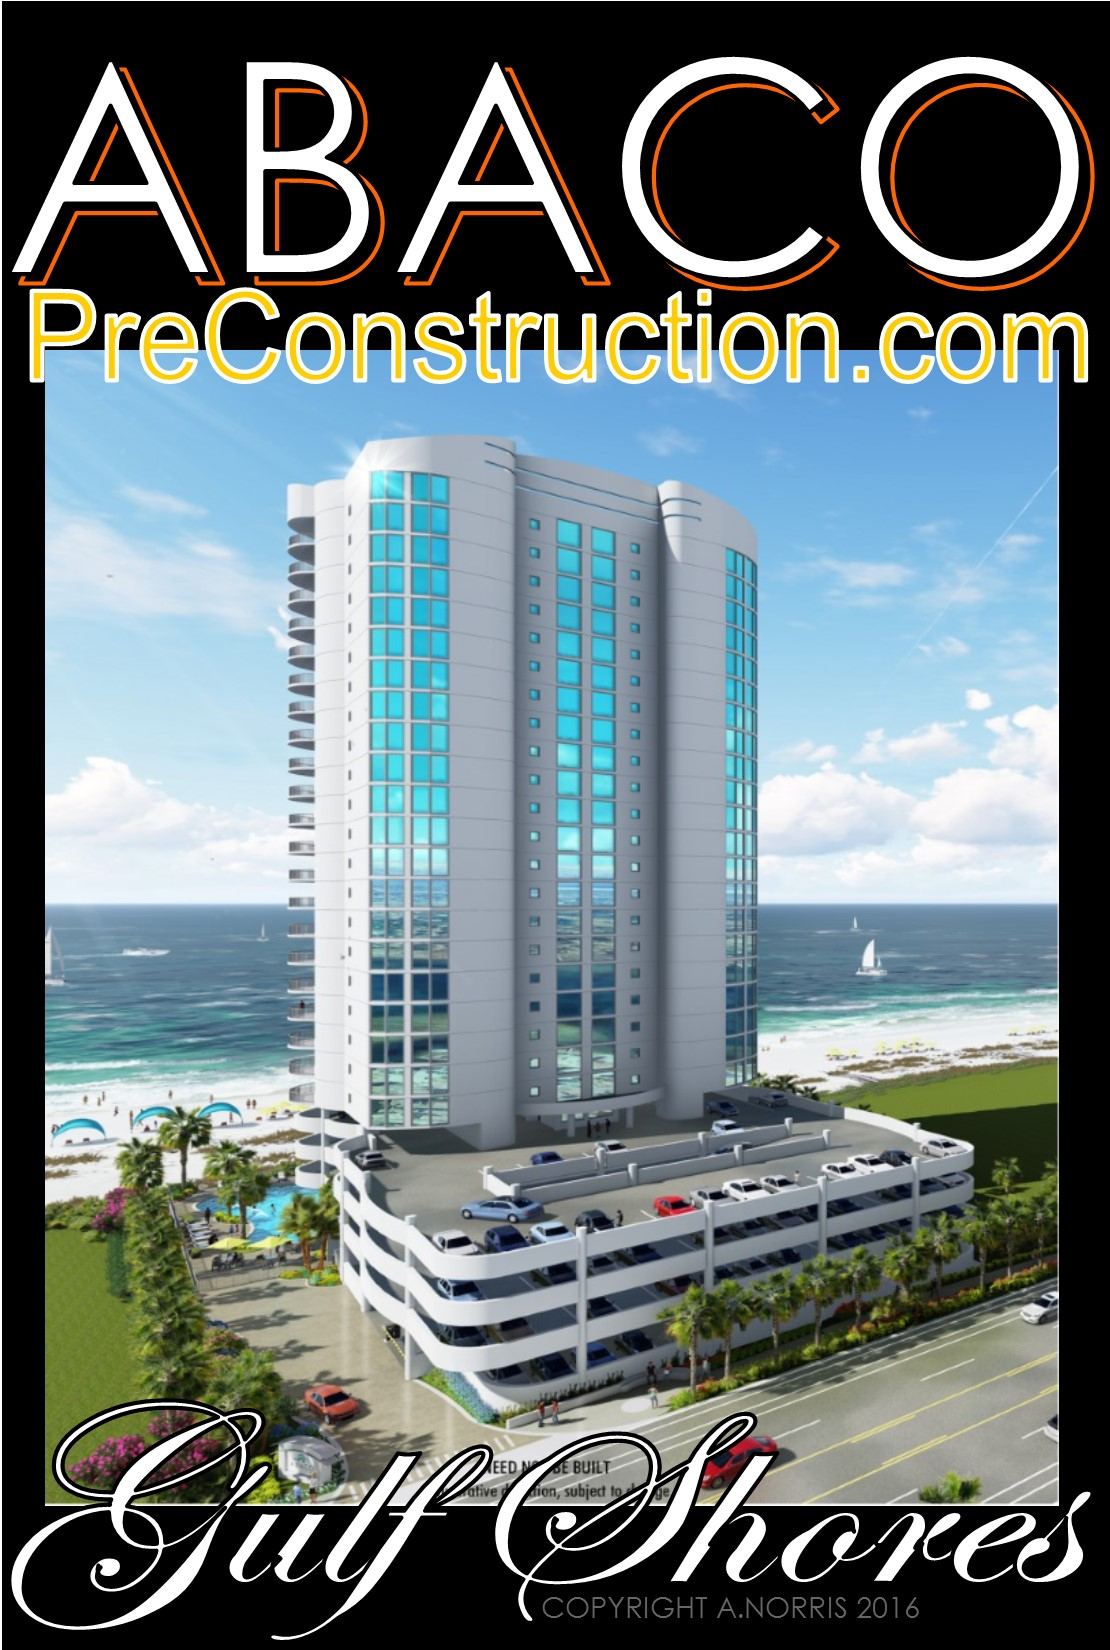 Abaco Preconstruction.jpg